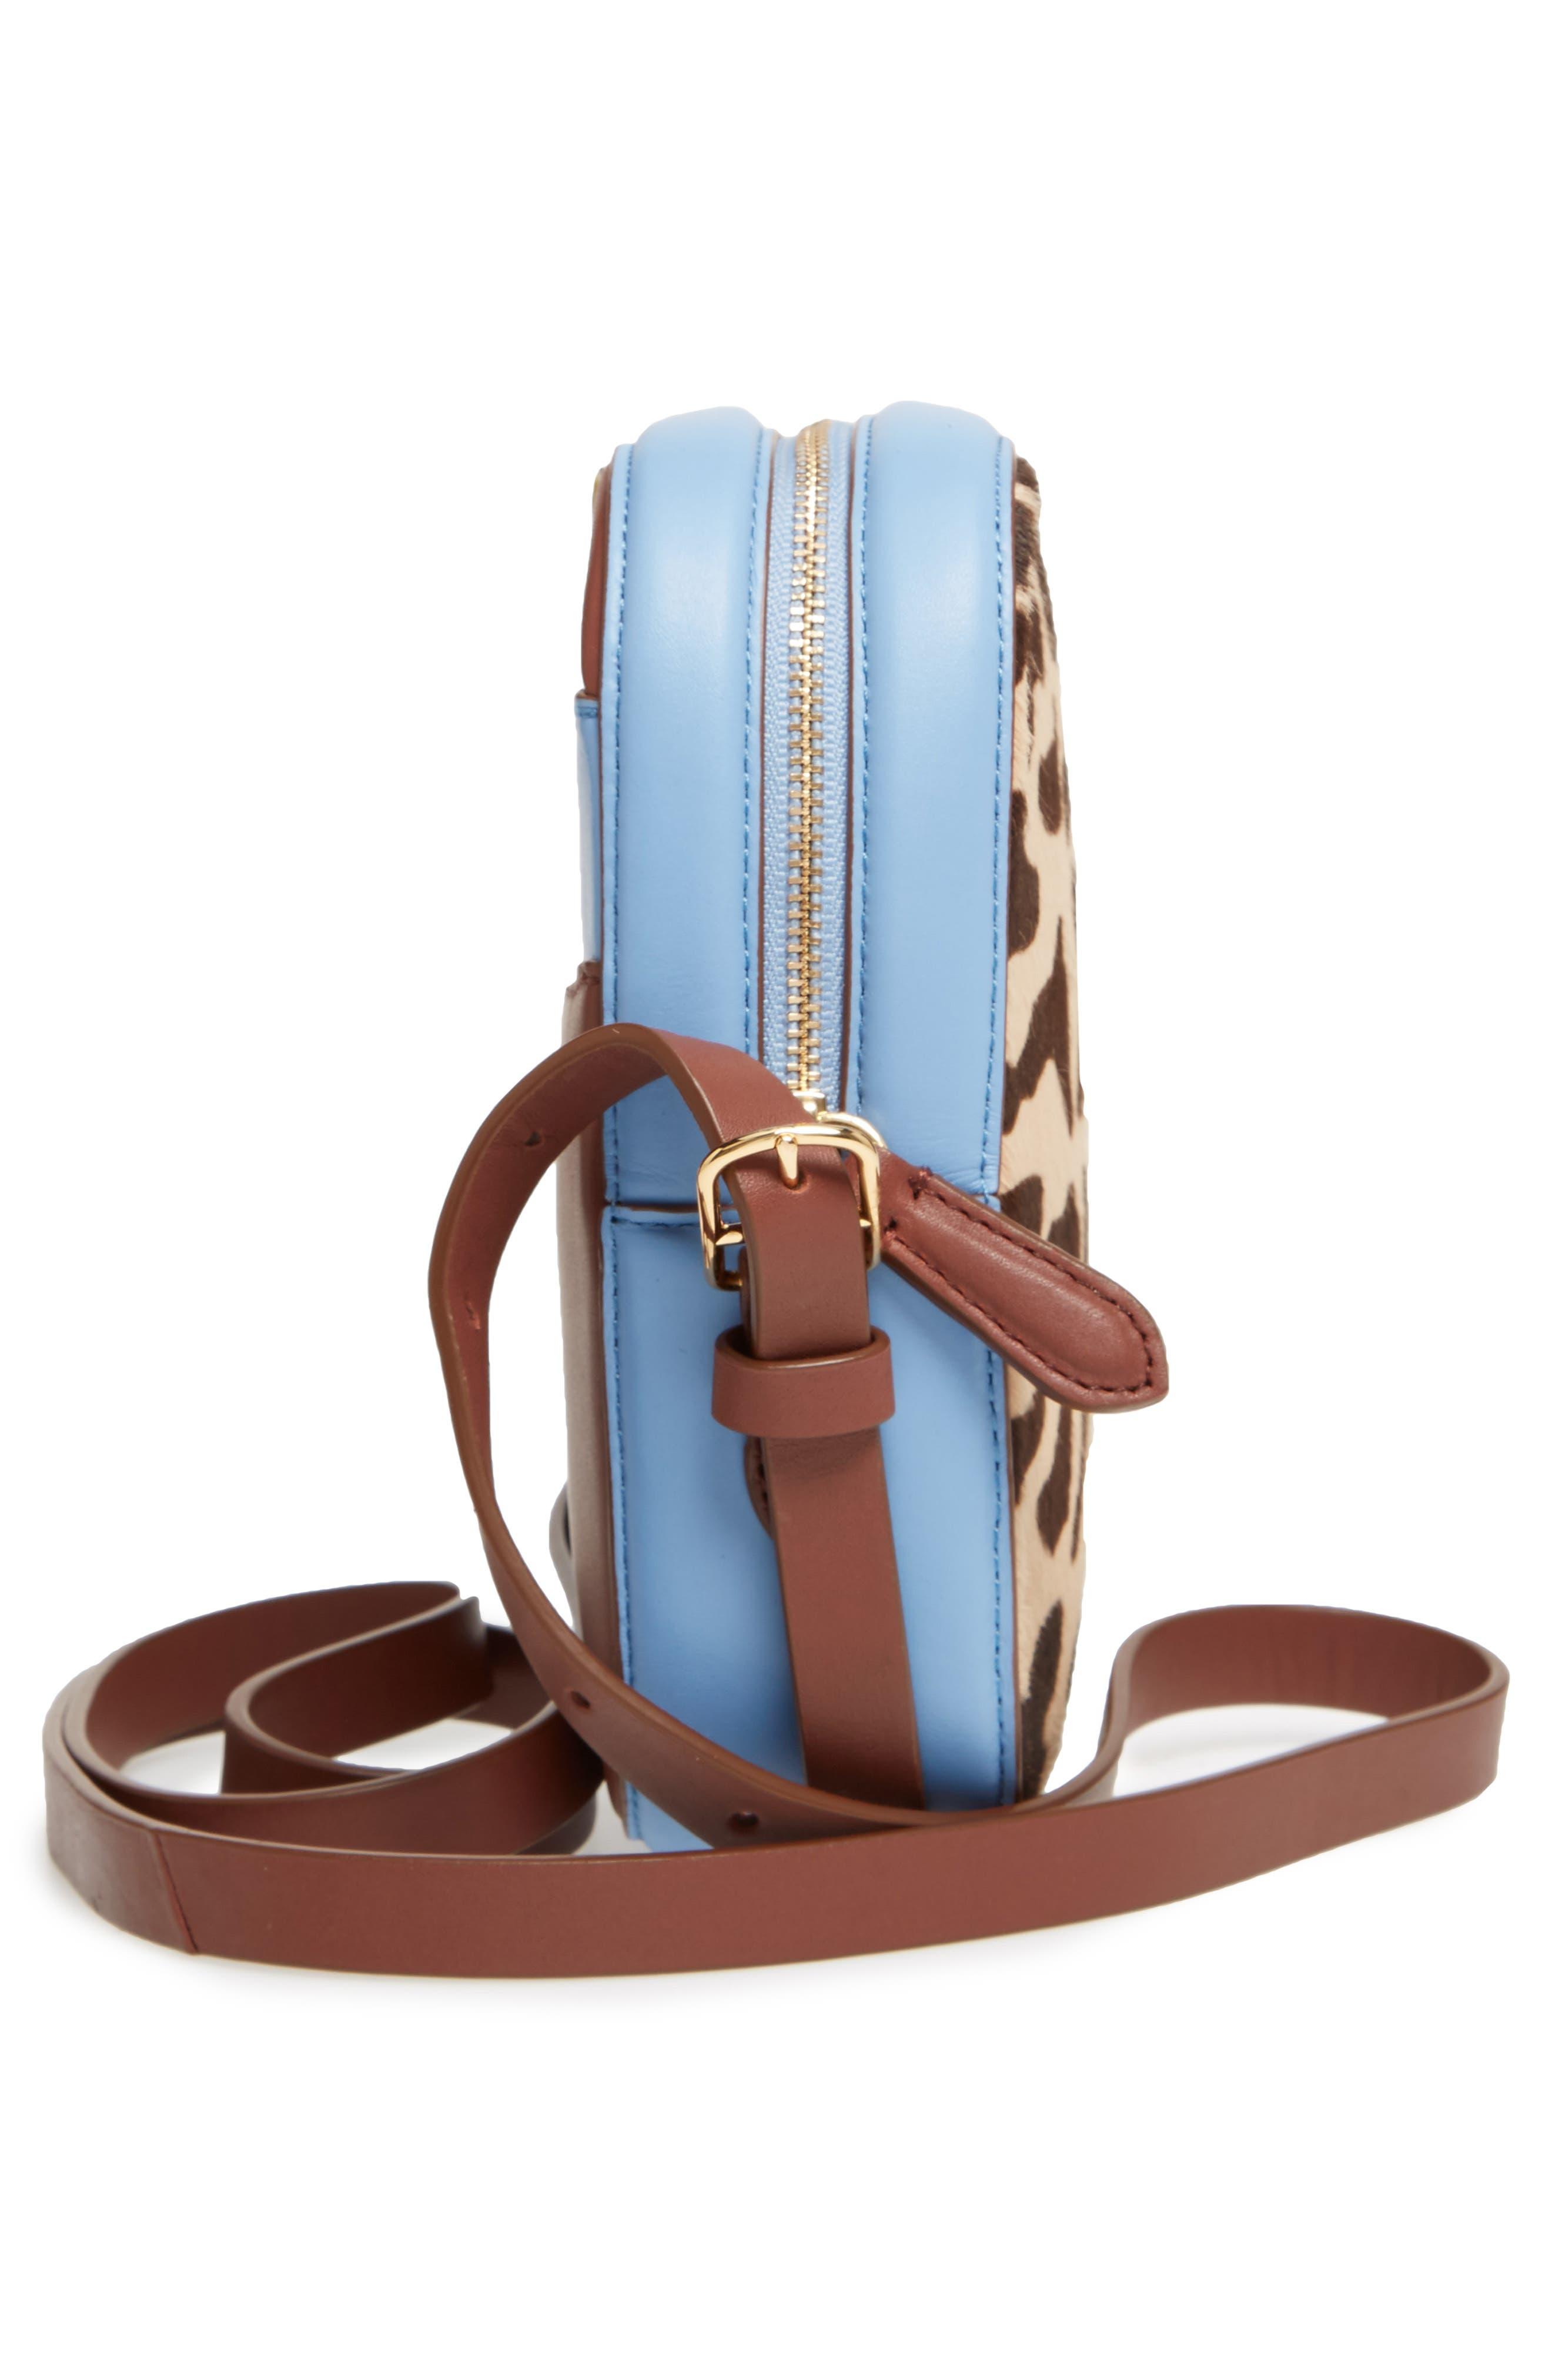 Leather & Genuine Calf Hair Camera Bag,                             Alternate thumbnail 5, color,                             Leopard/ Powder Blue